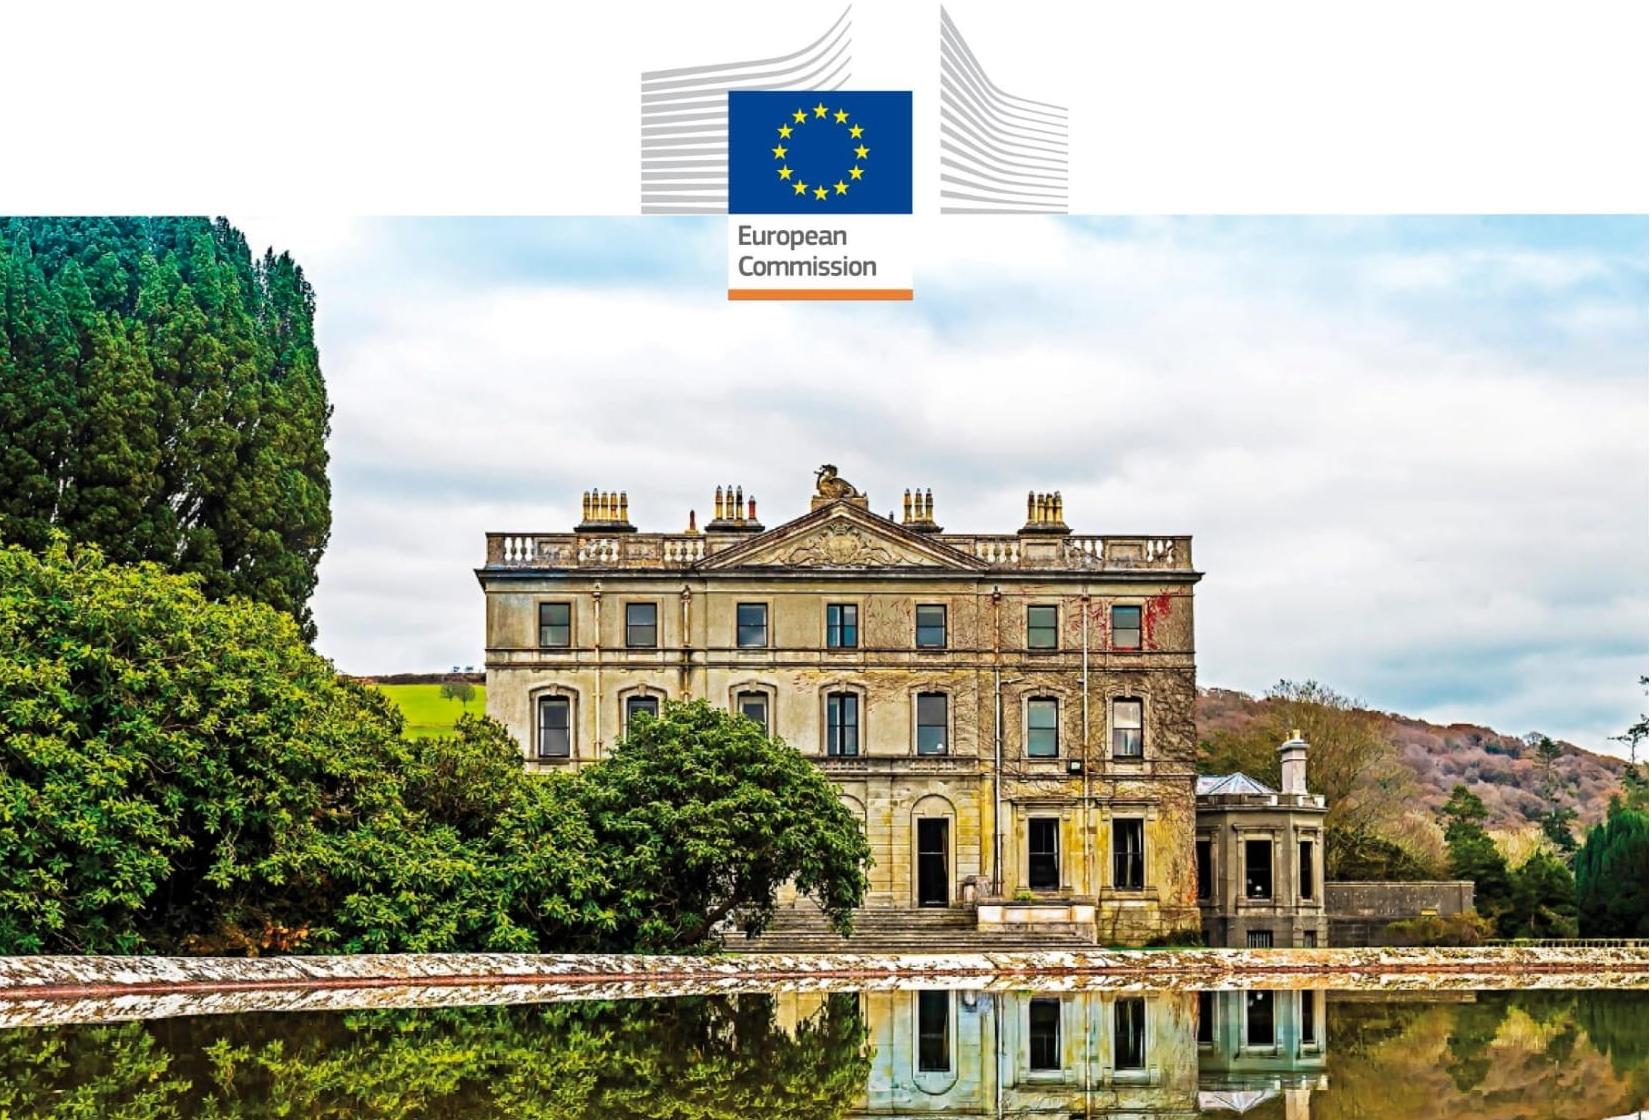 https://www.sothebysrealty.ro/wp/wp-content/uploads/2019/12/studiul-european-case-de-patrimoniu-2019.jpg